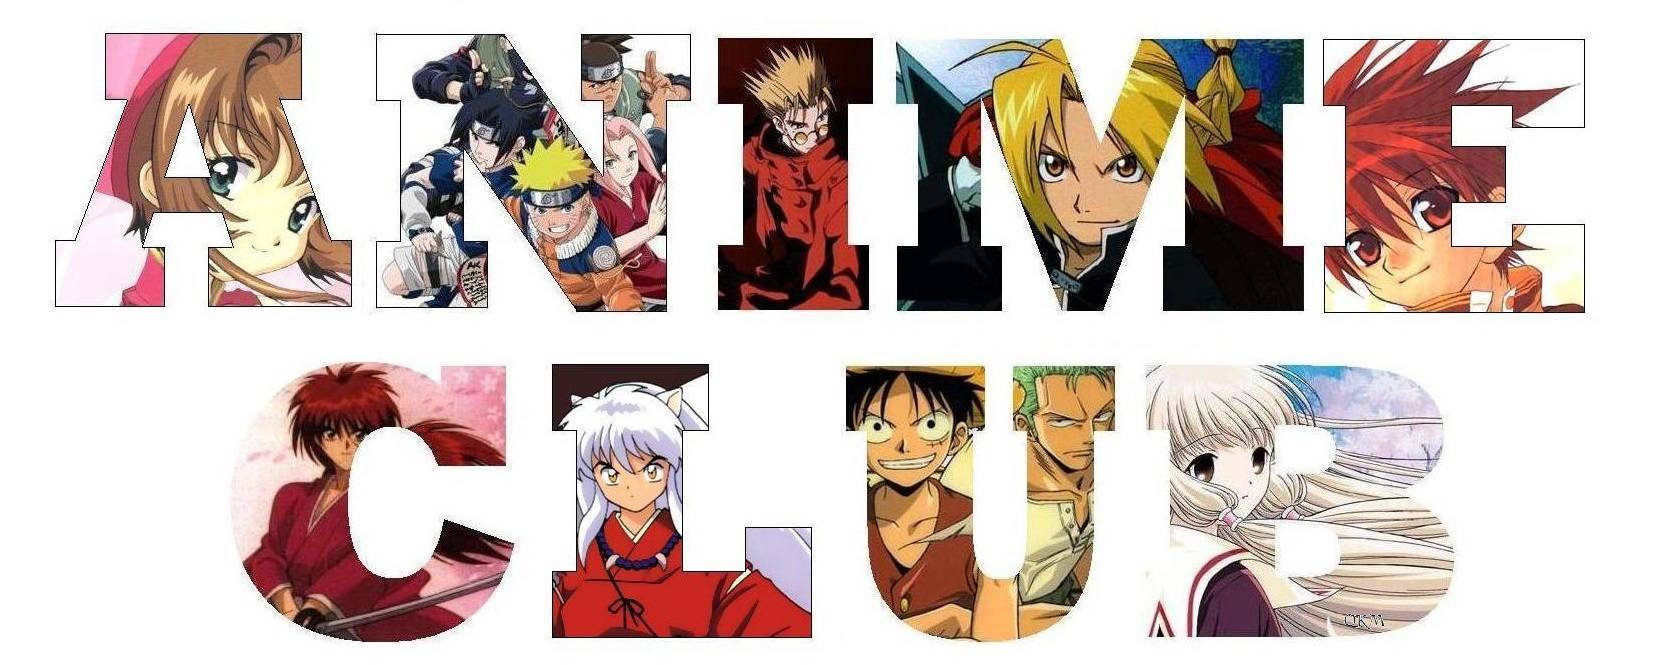 8cb0749535459c6f0a1e_anime.jpg